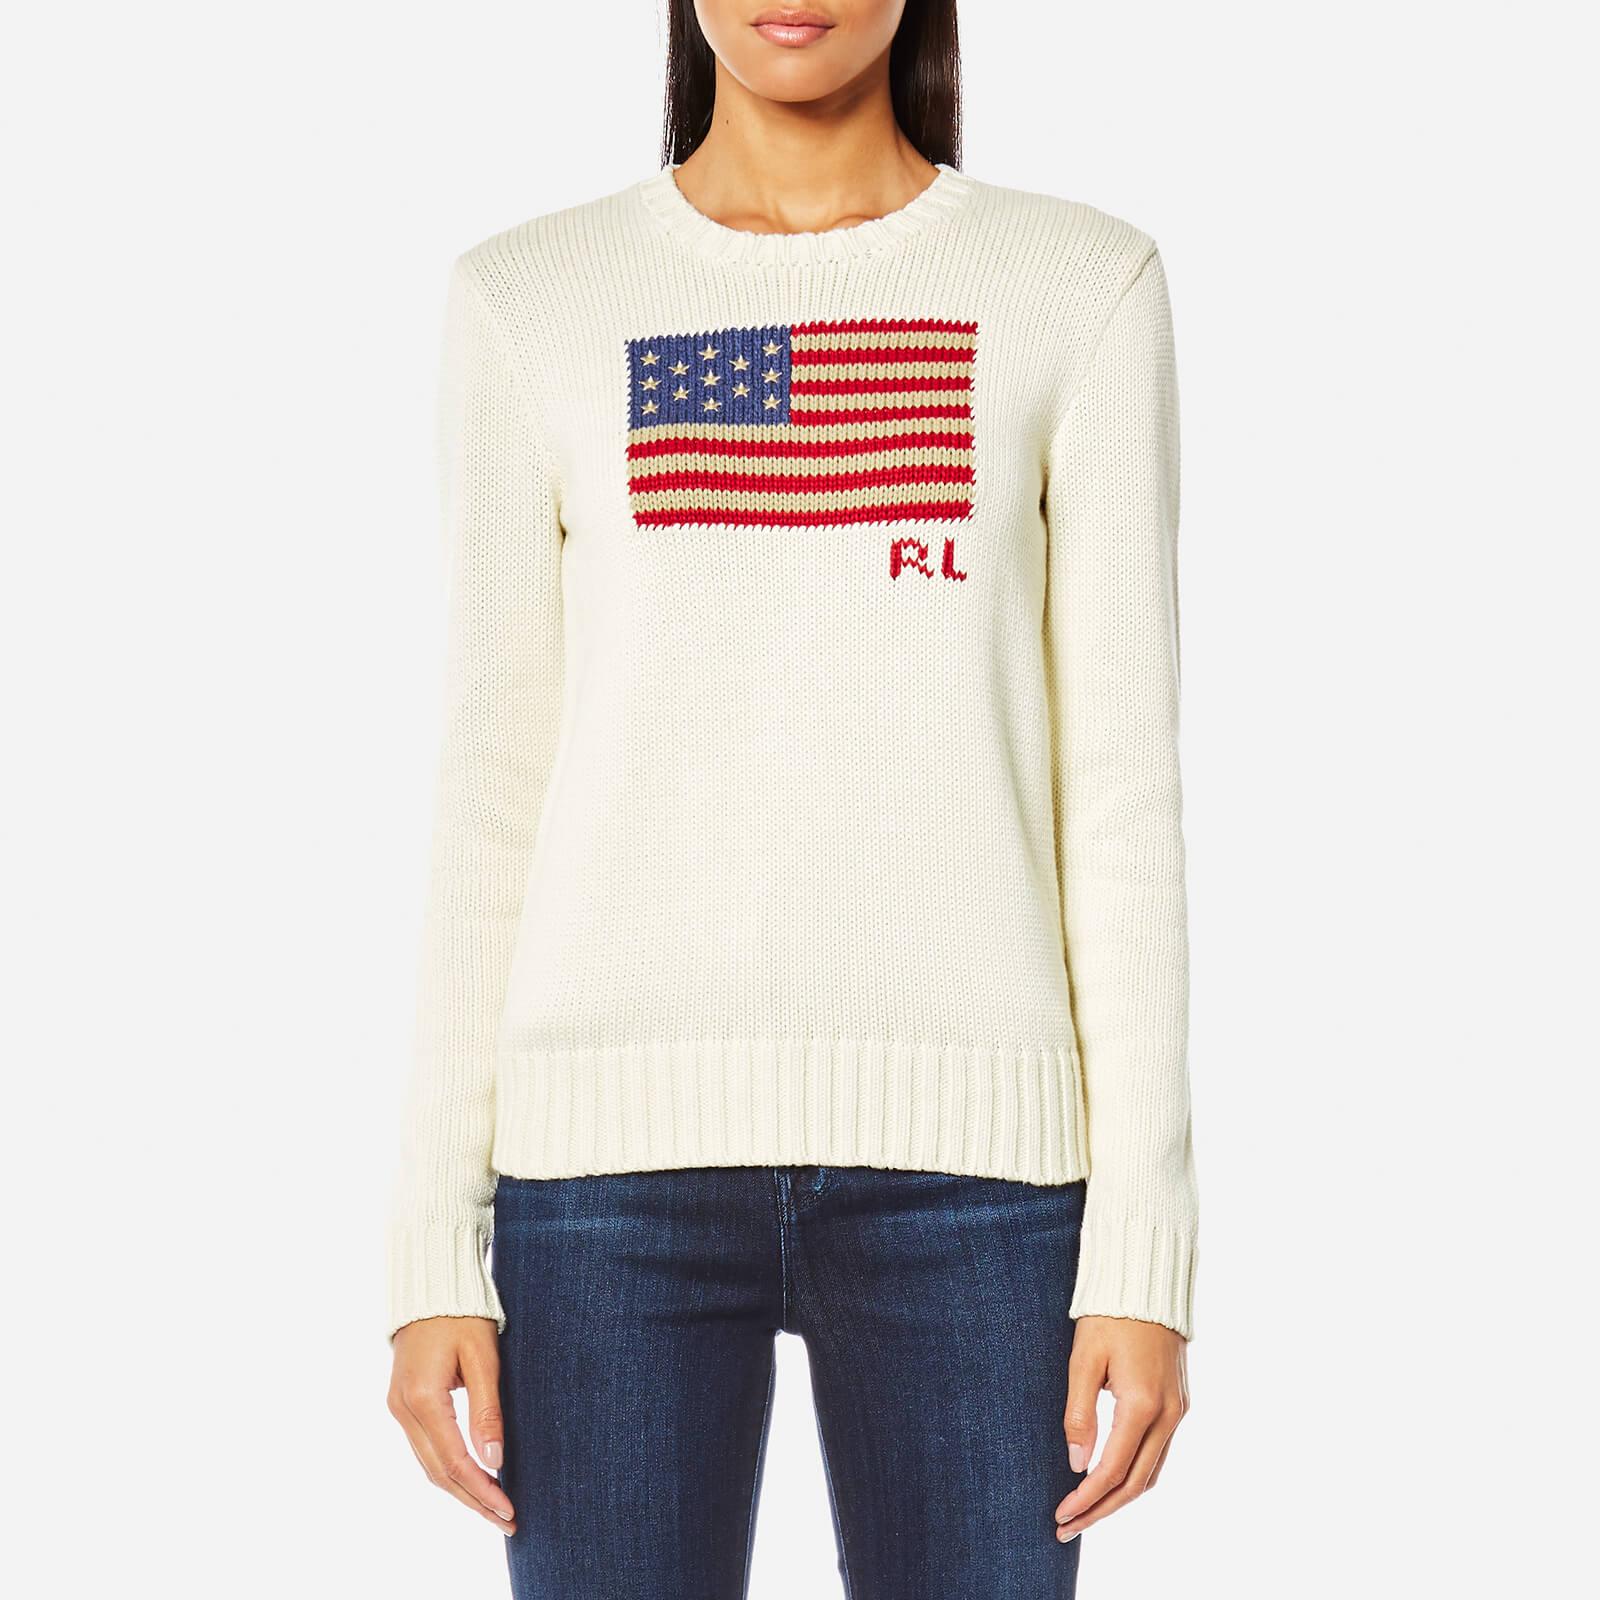 04cd081ff Polo Ralph Lauren Women s Crew Neck Flag Jumper - Cream Multi